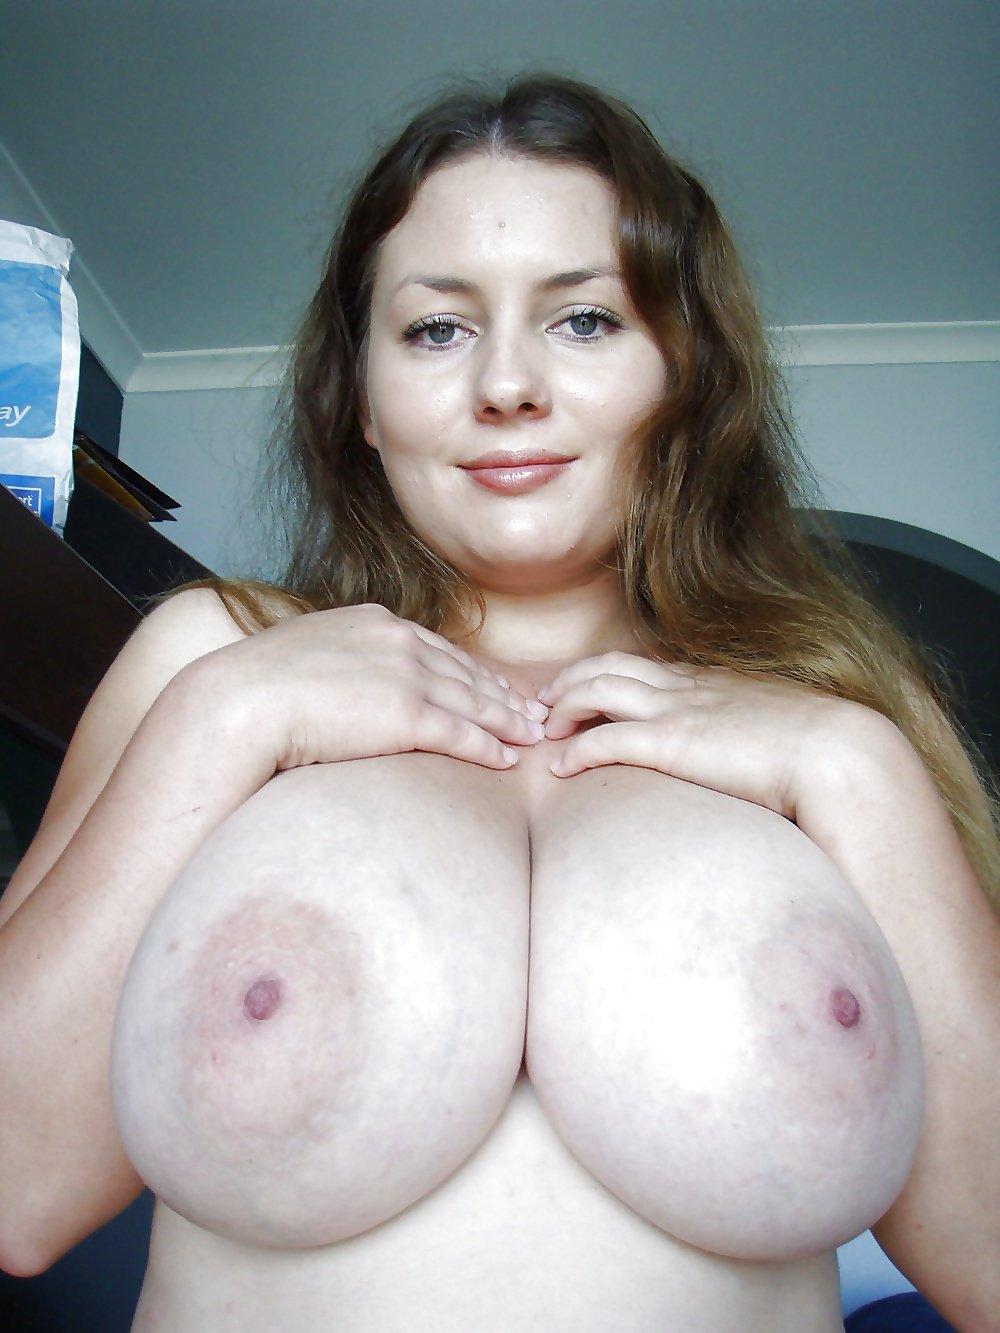 ogromnaya-grud-domashnee-video-video-ya-masturbiruyu